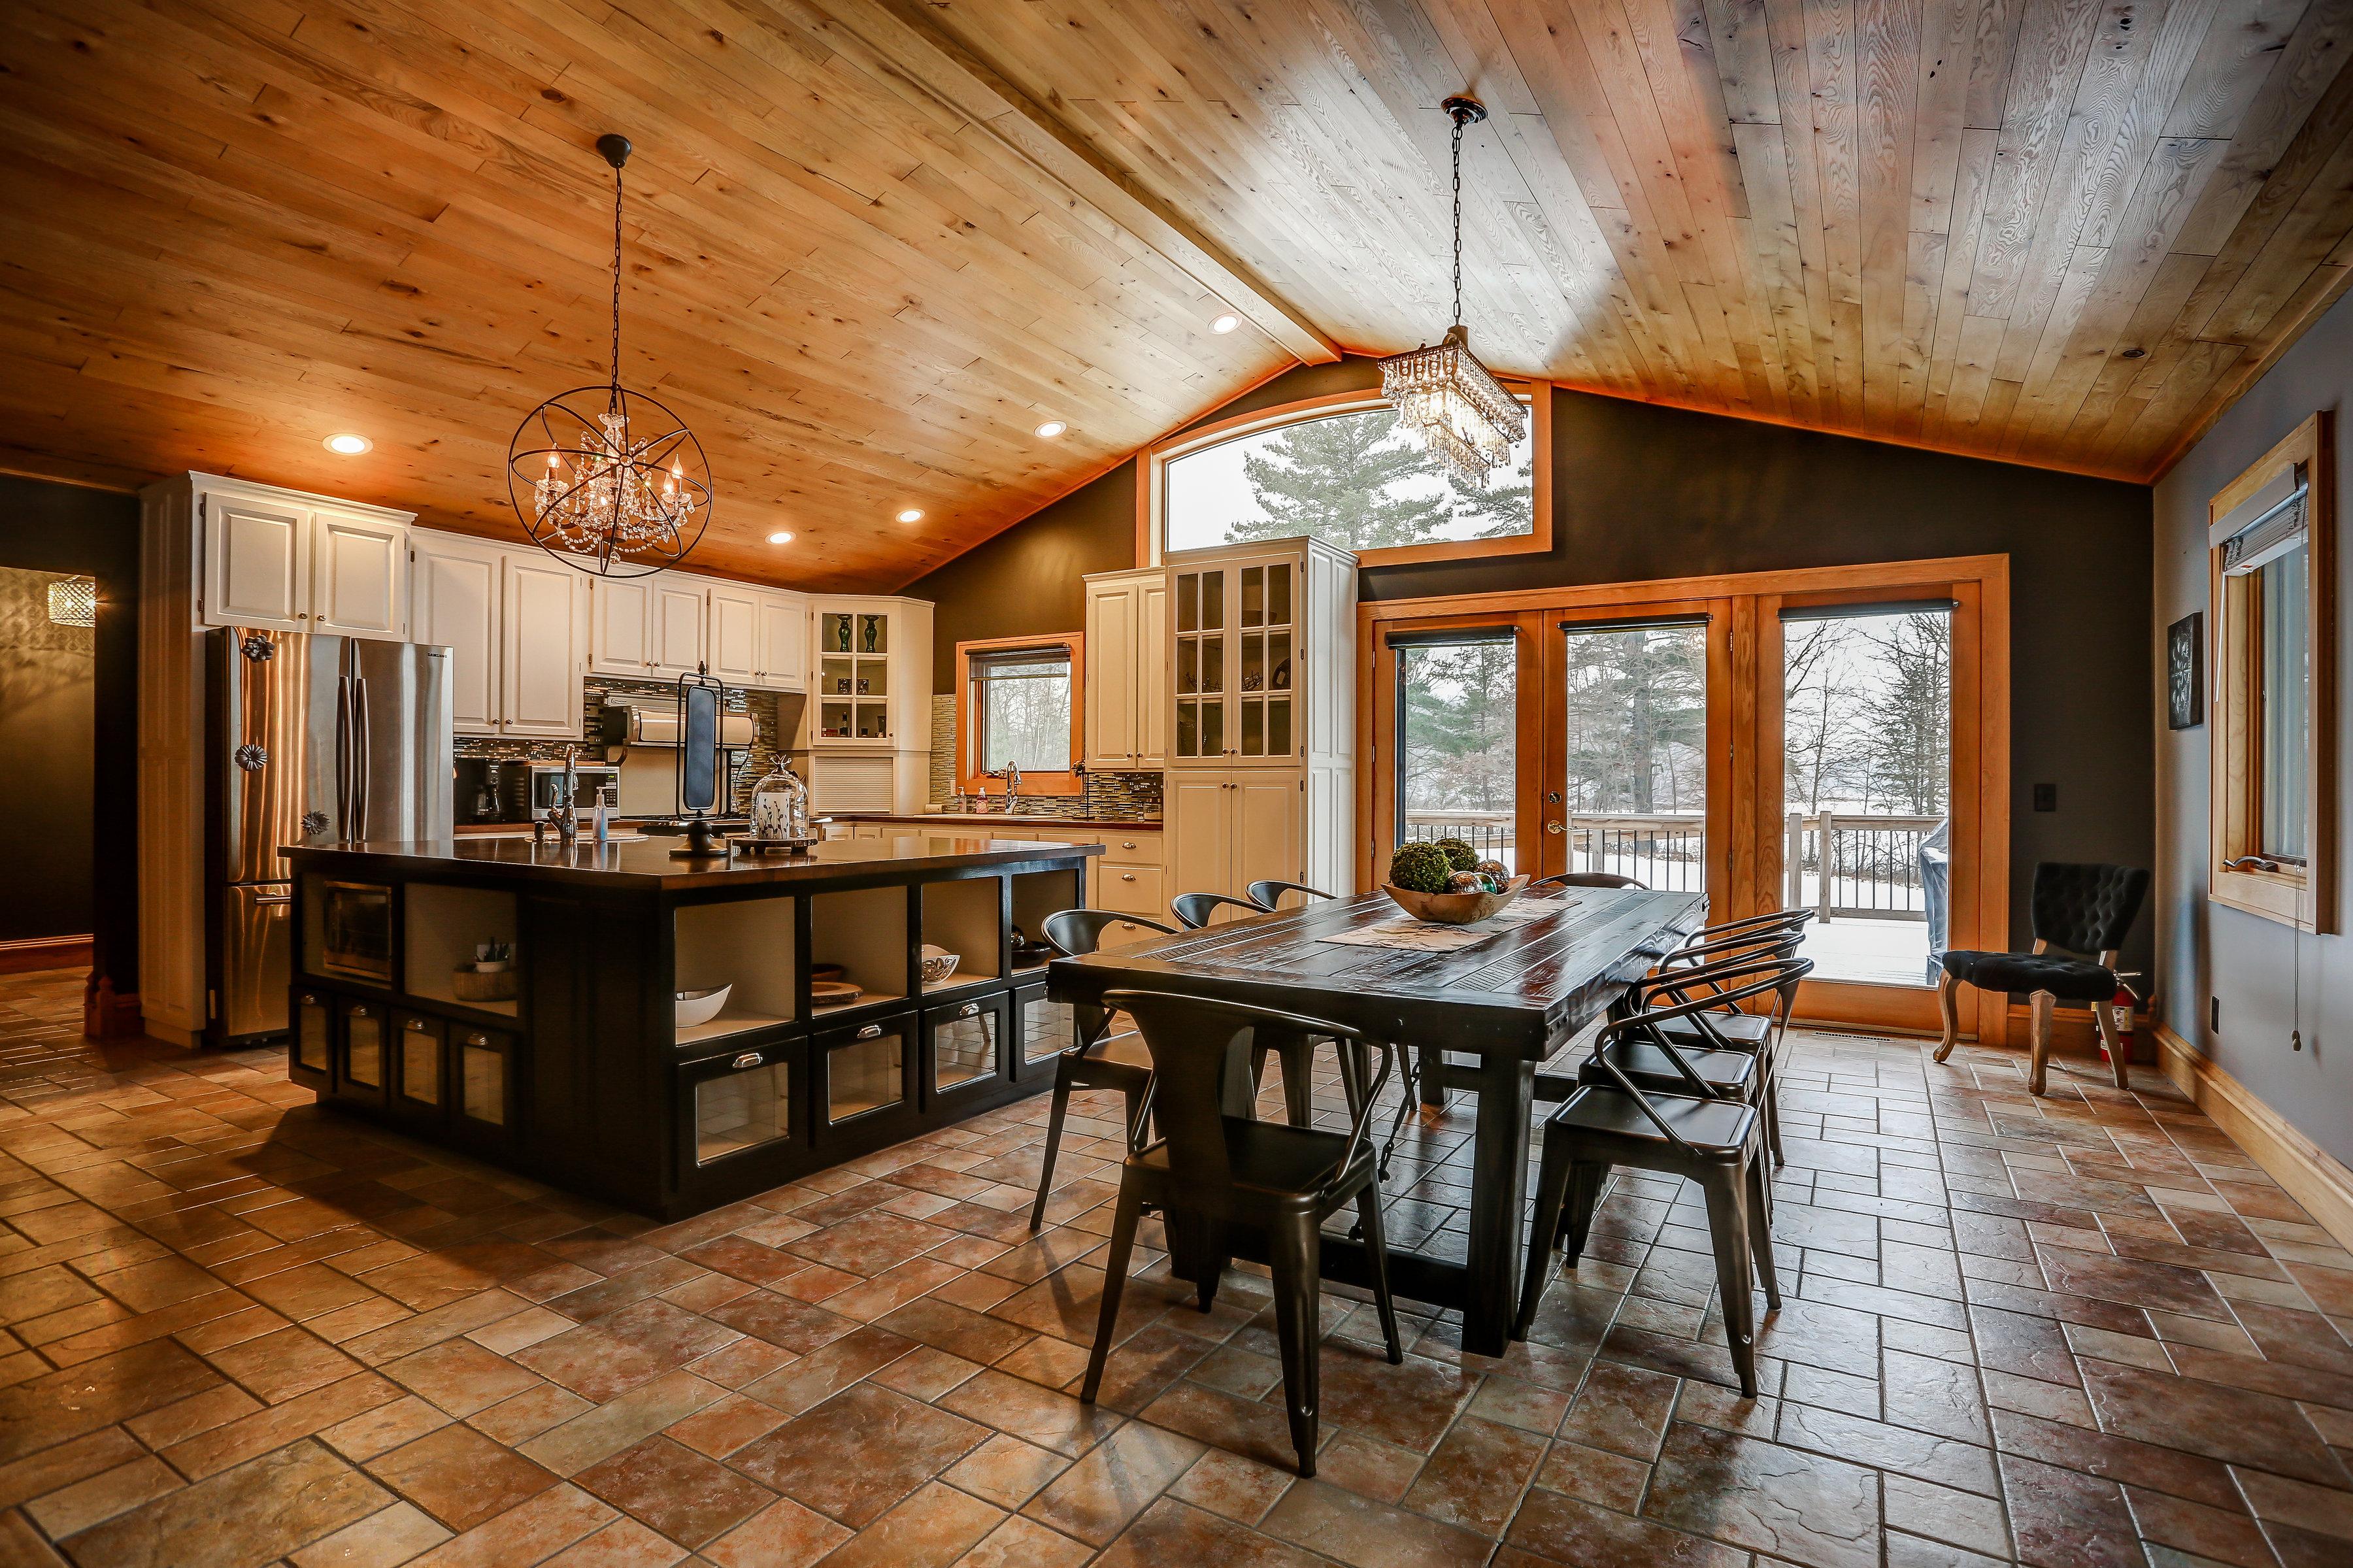 Bliss House Kitchen